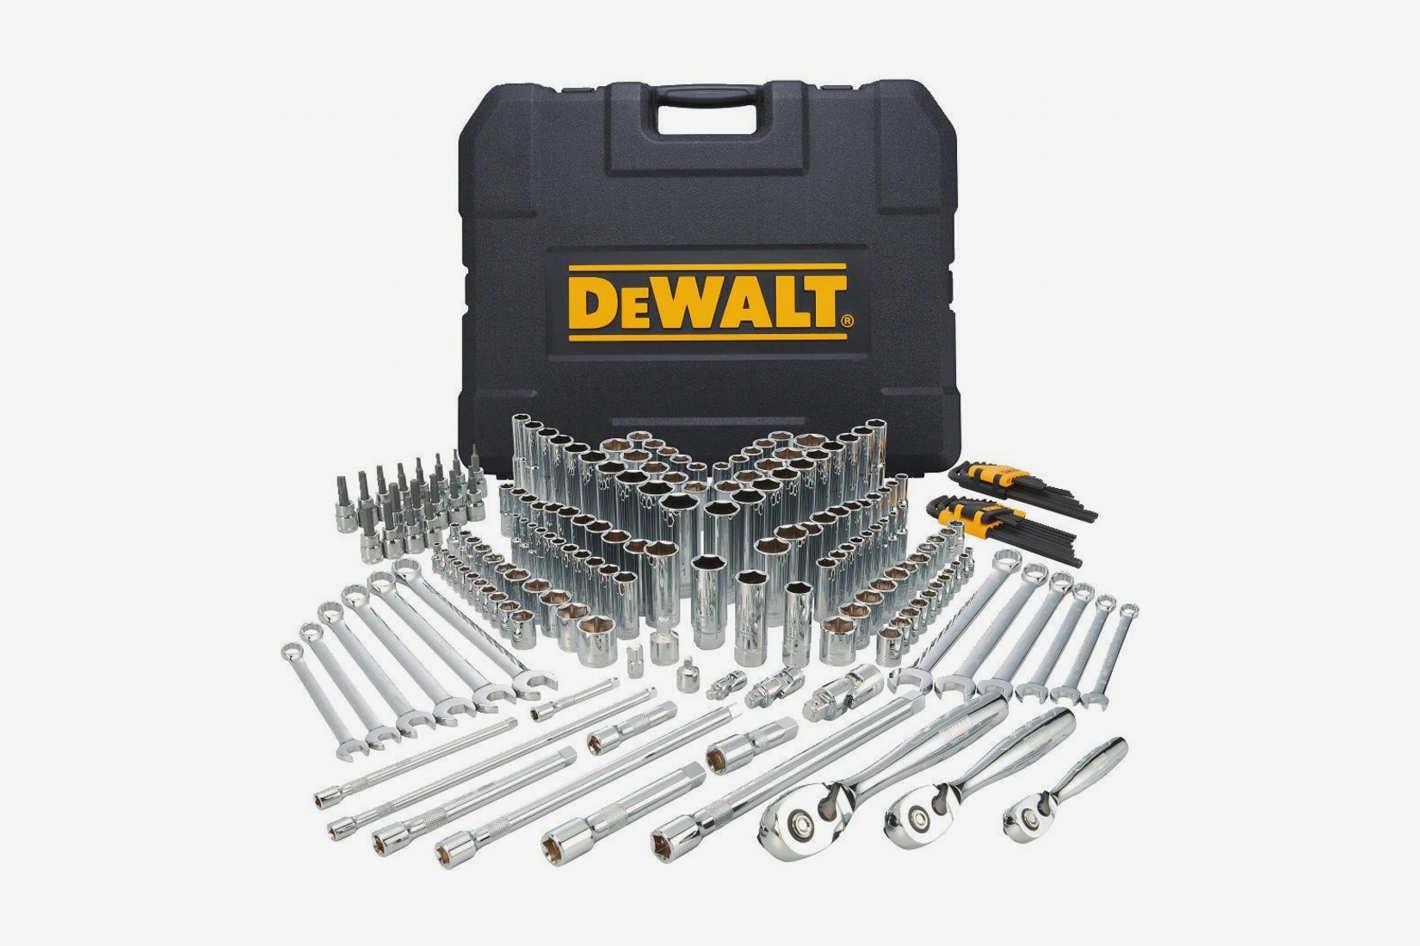 DEWALT Mechanics Tools Kit and Socket Set, 204-Piece